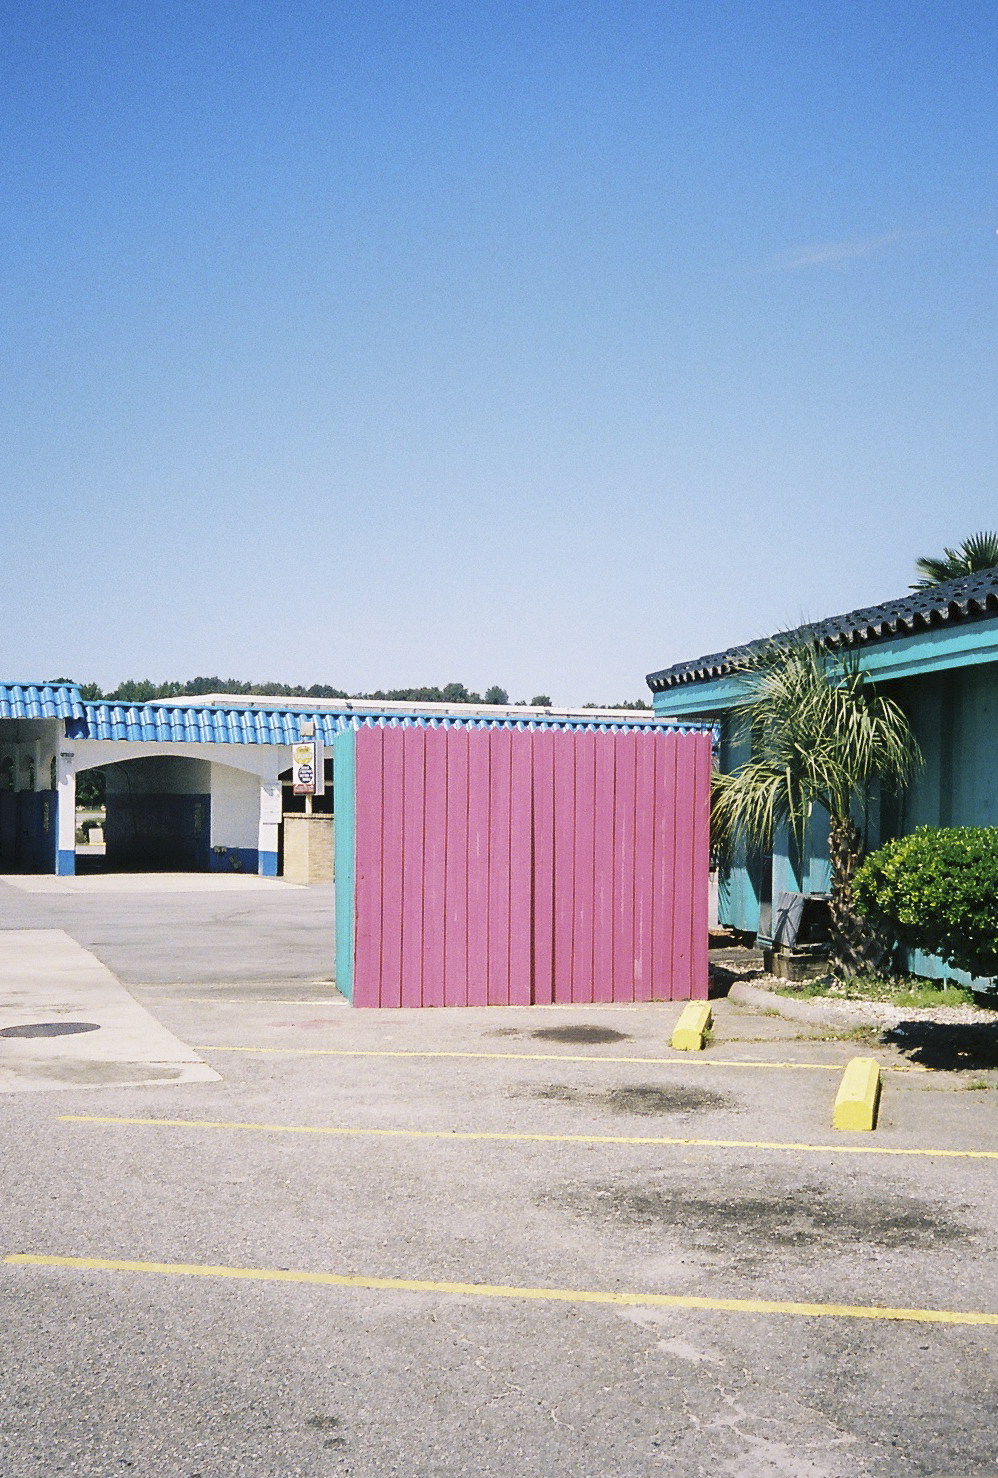 South of the Border, USA, 2012